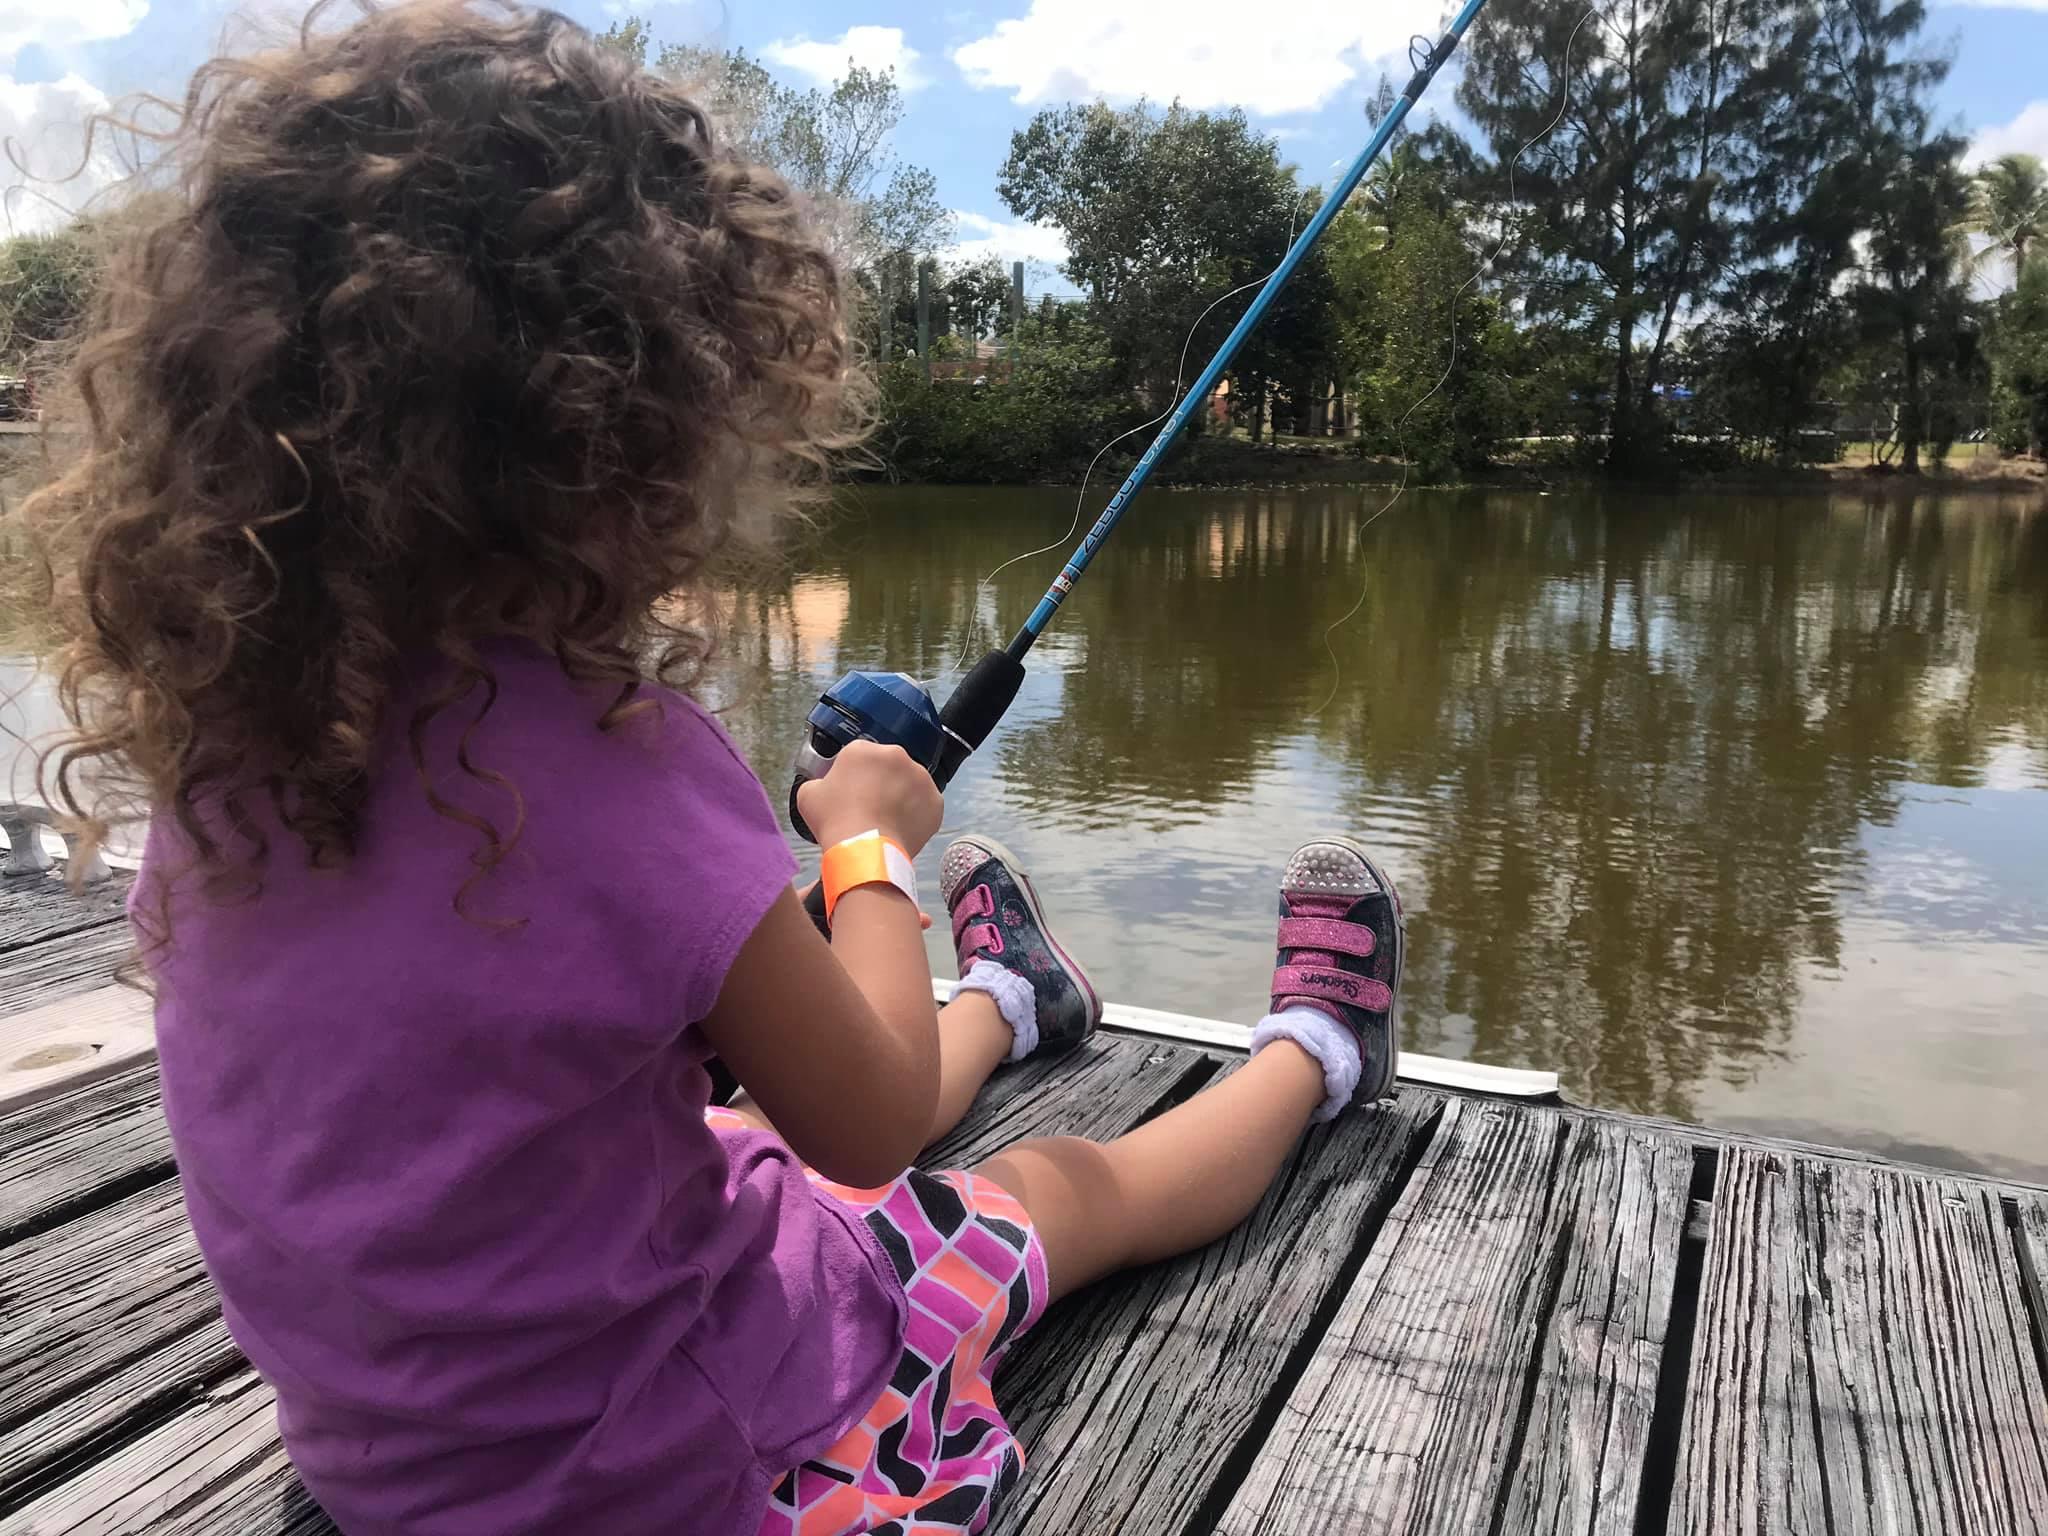 hooked_on_fishing.jpg